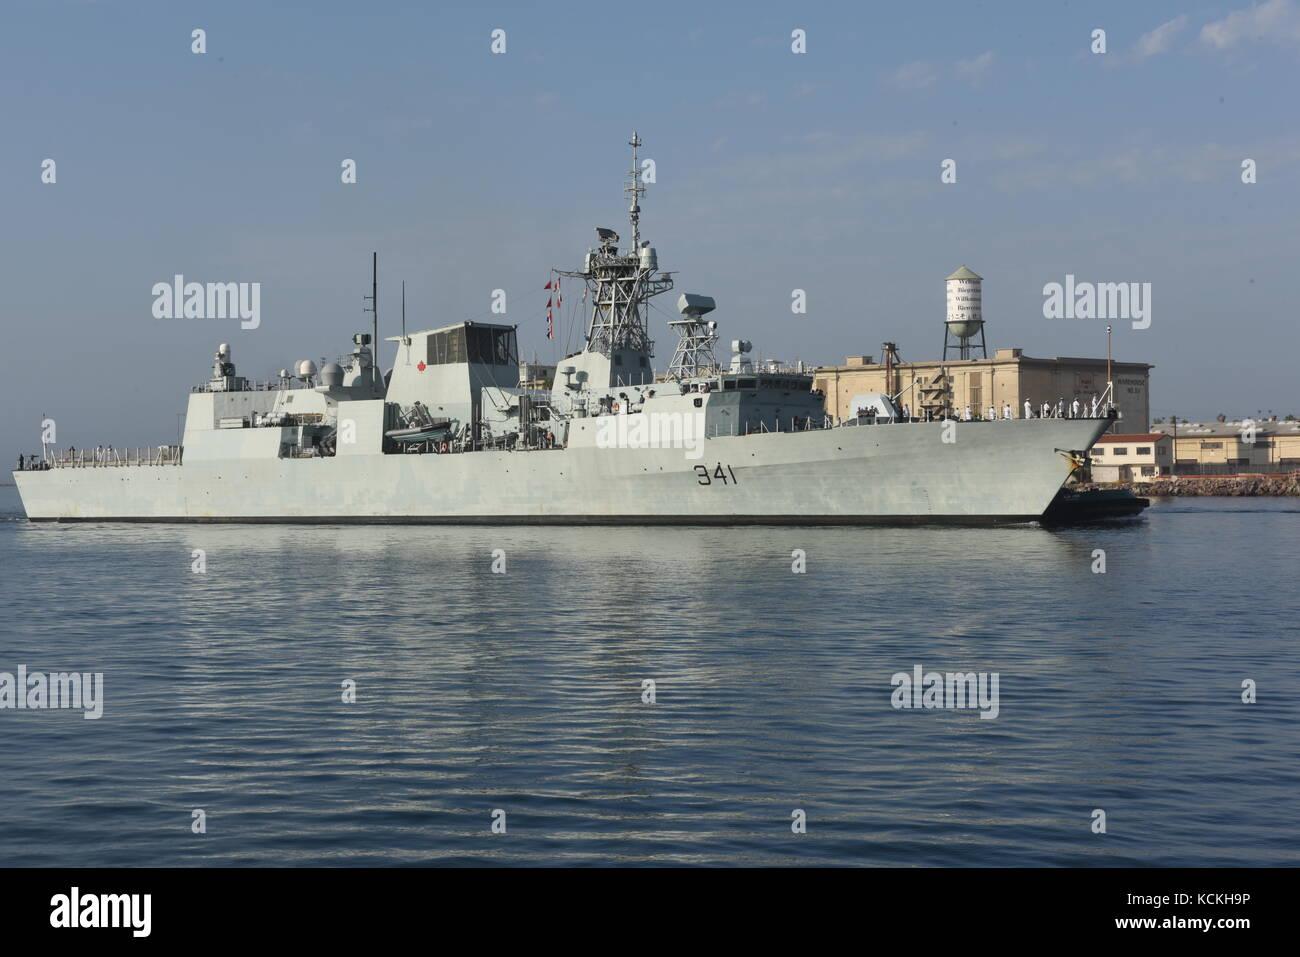 The Royal Canadian Navy Halifax-class frigate HMCS Ottawa